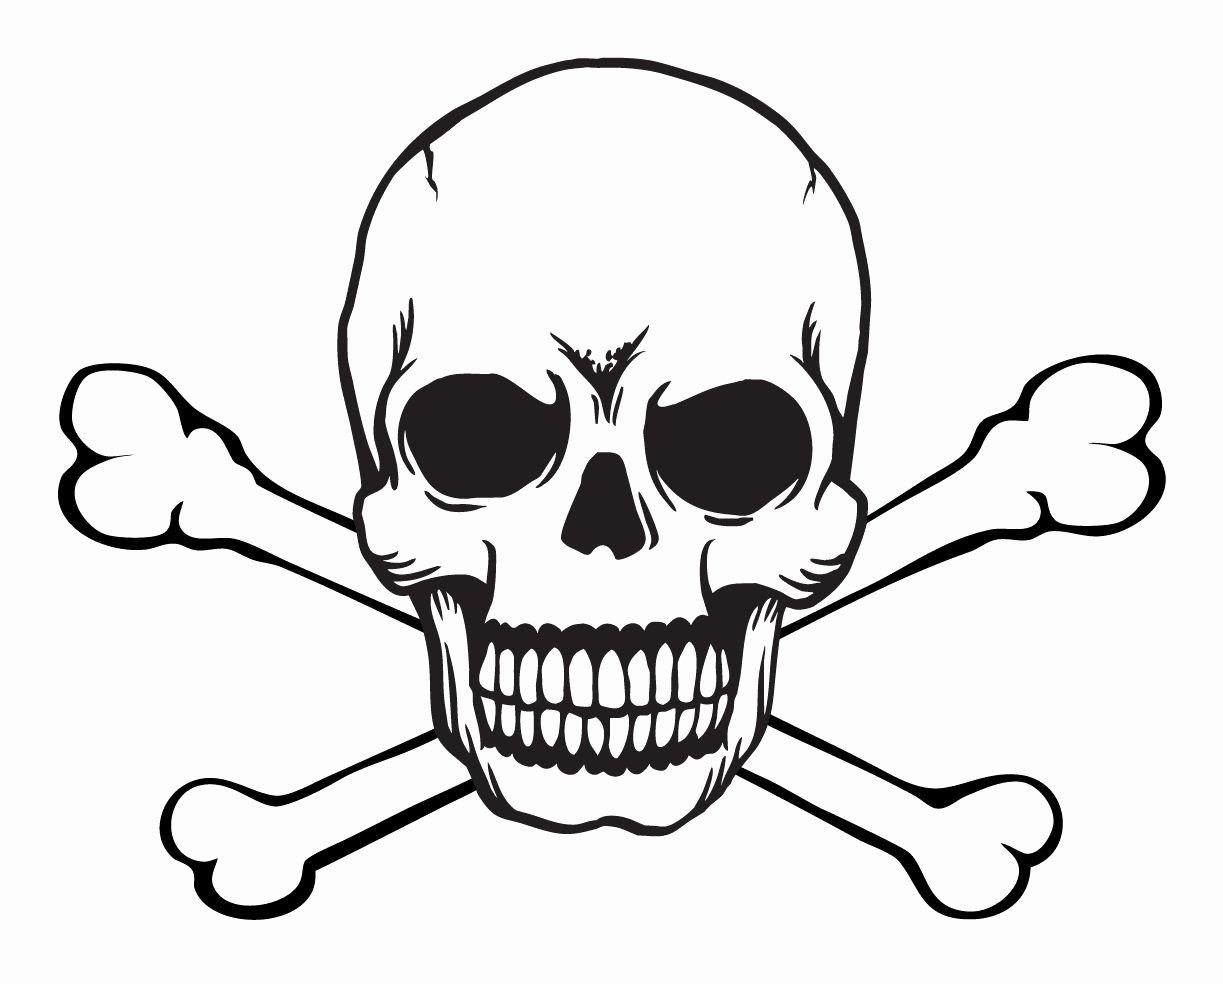 Skull Stencils Free Printable Awesome Skull Stencils Free Printable